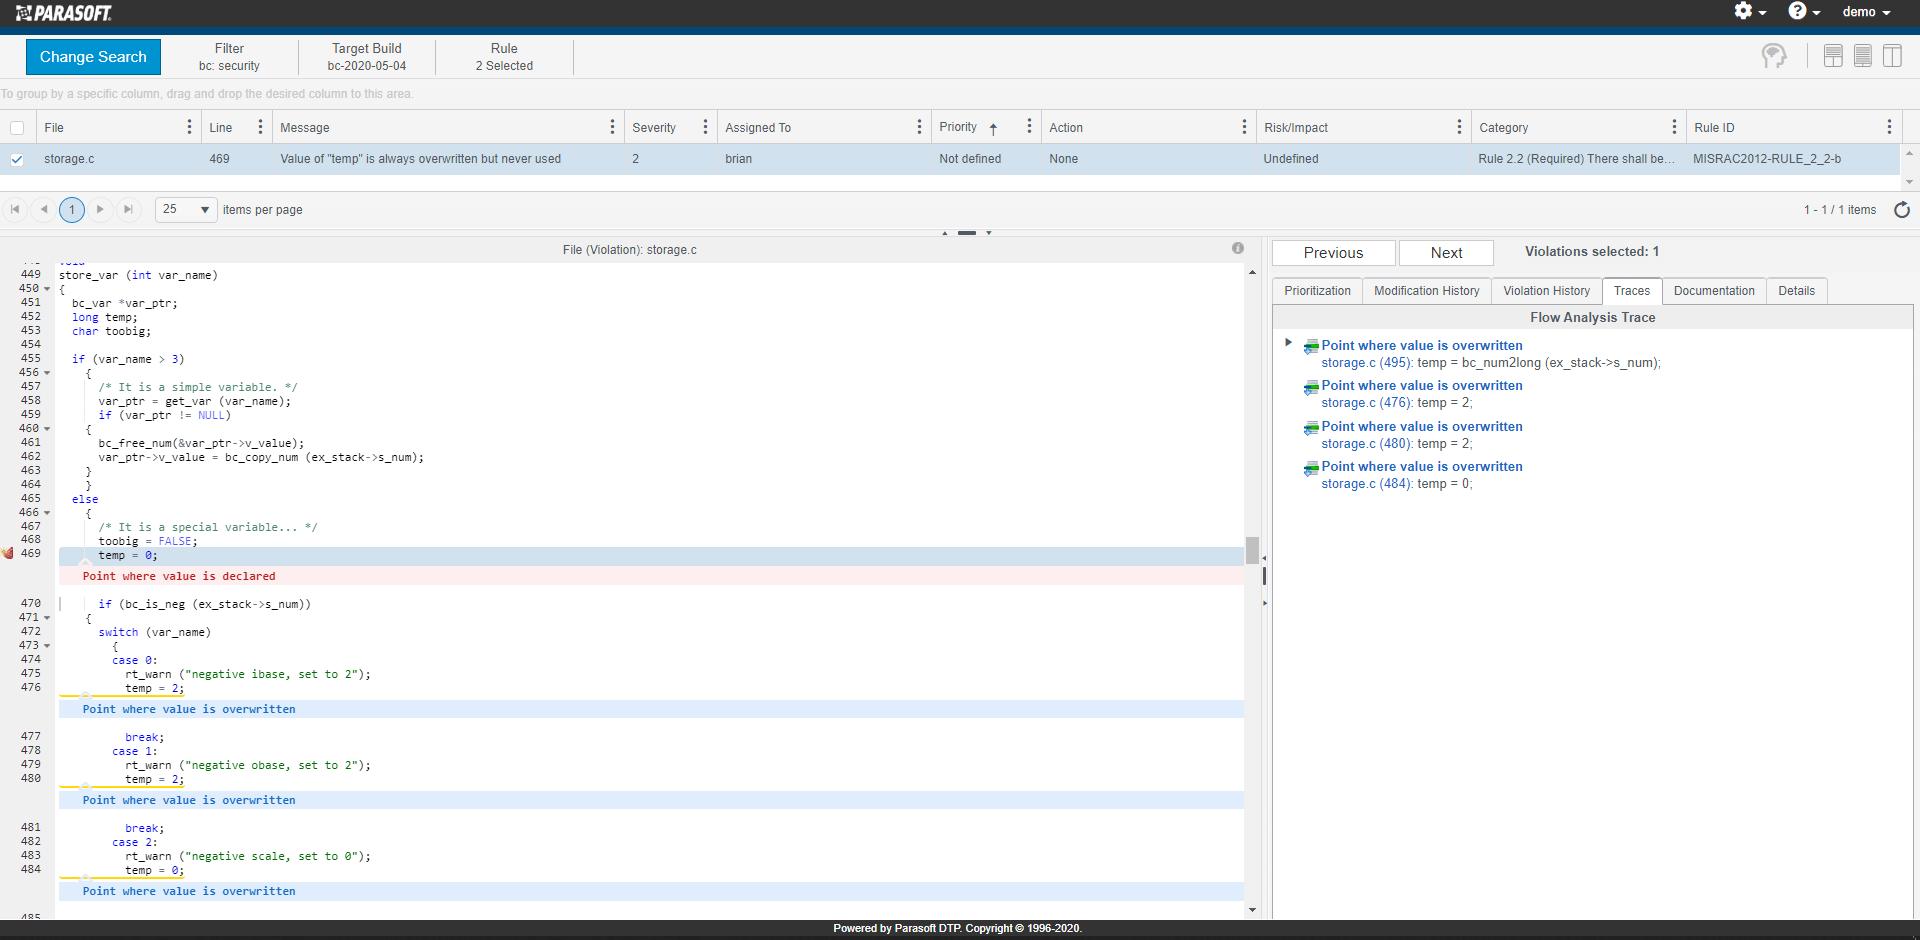 DTP Interactive Navigation Results